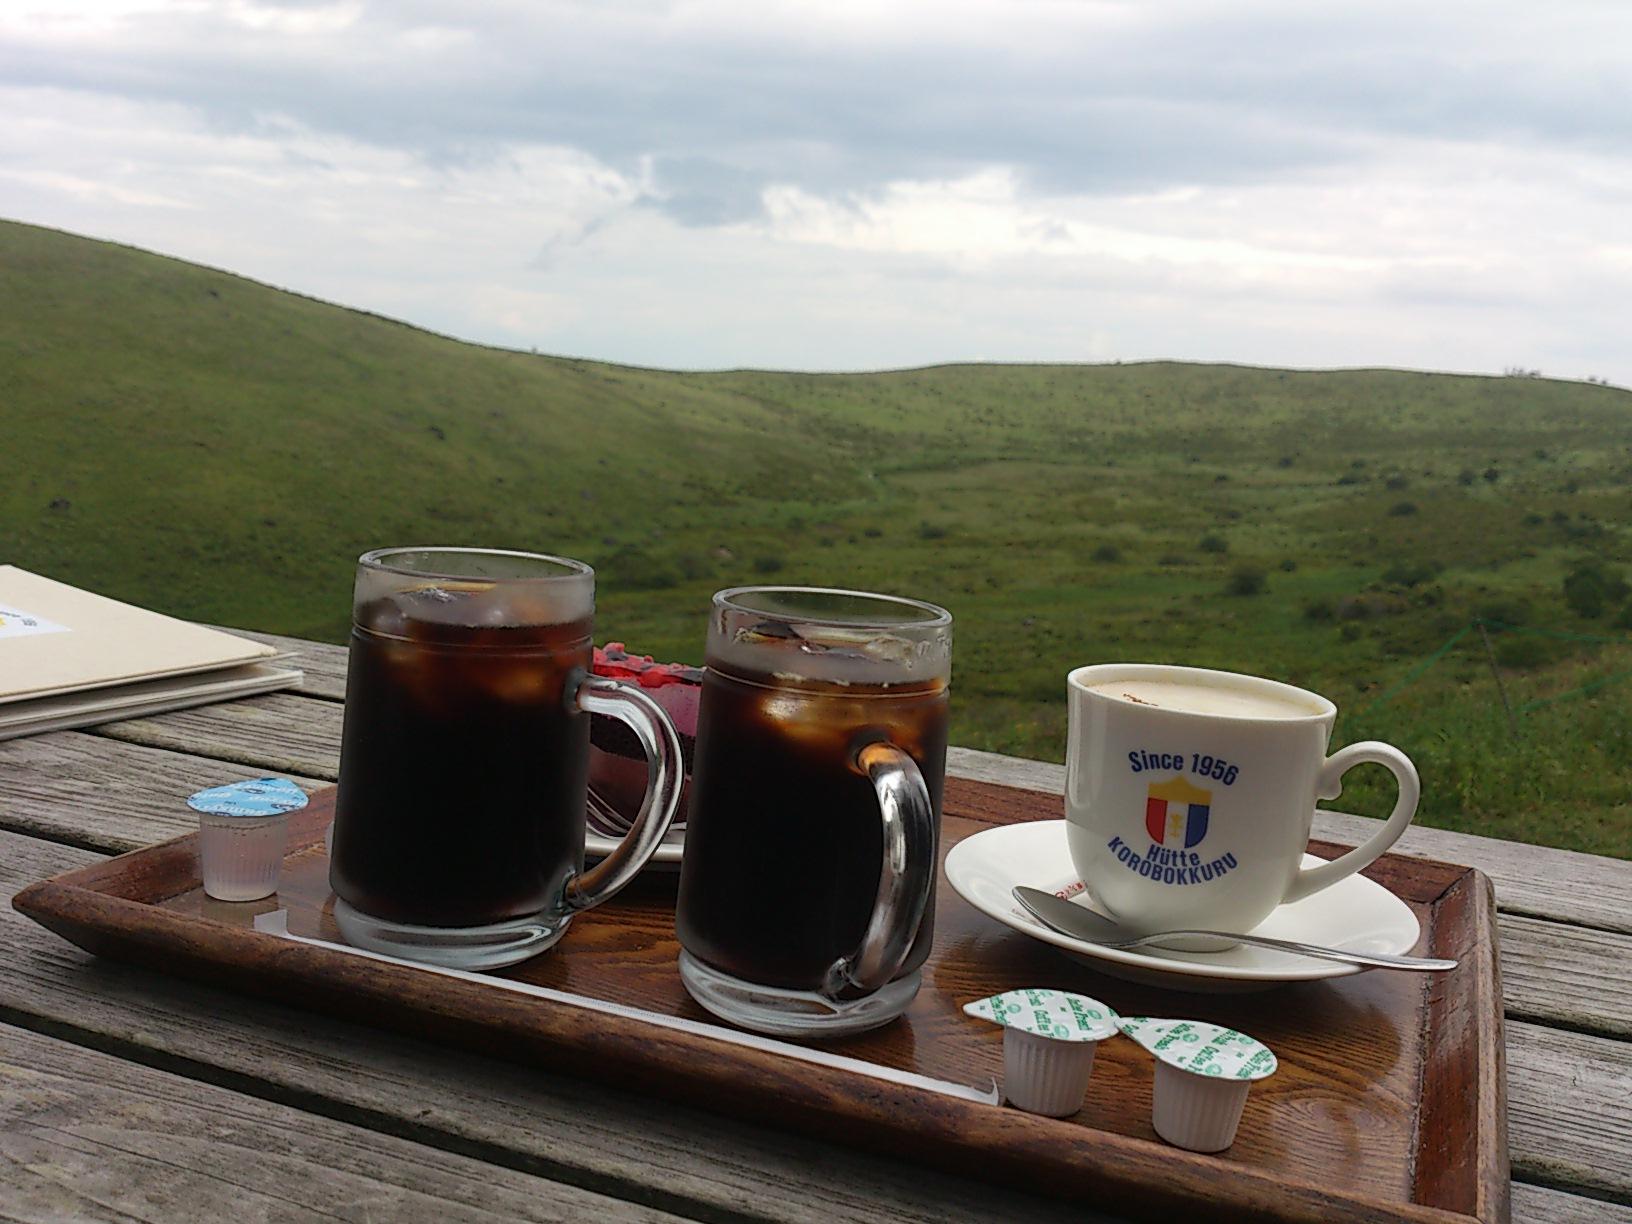 2013-08-21coffee.jpg